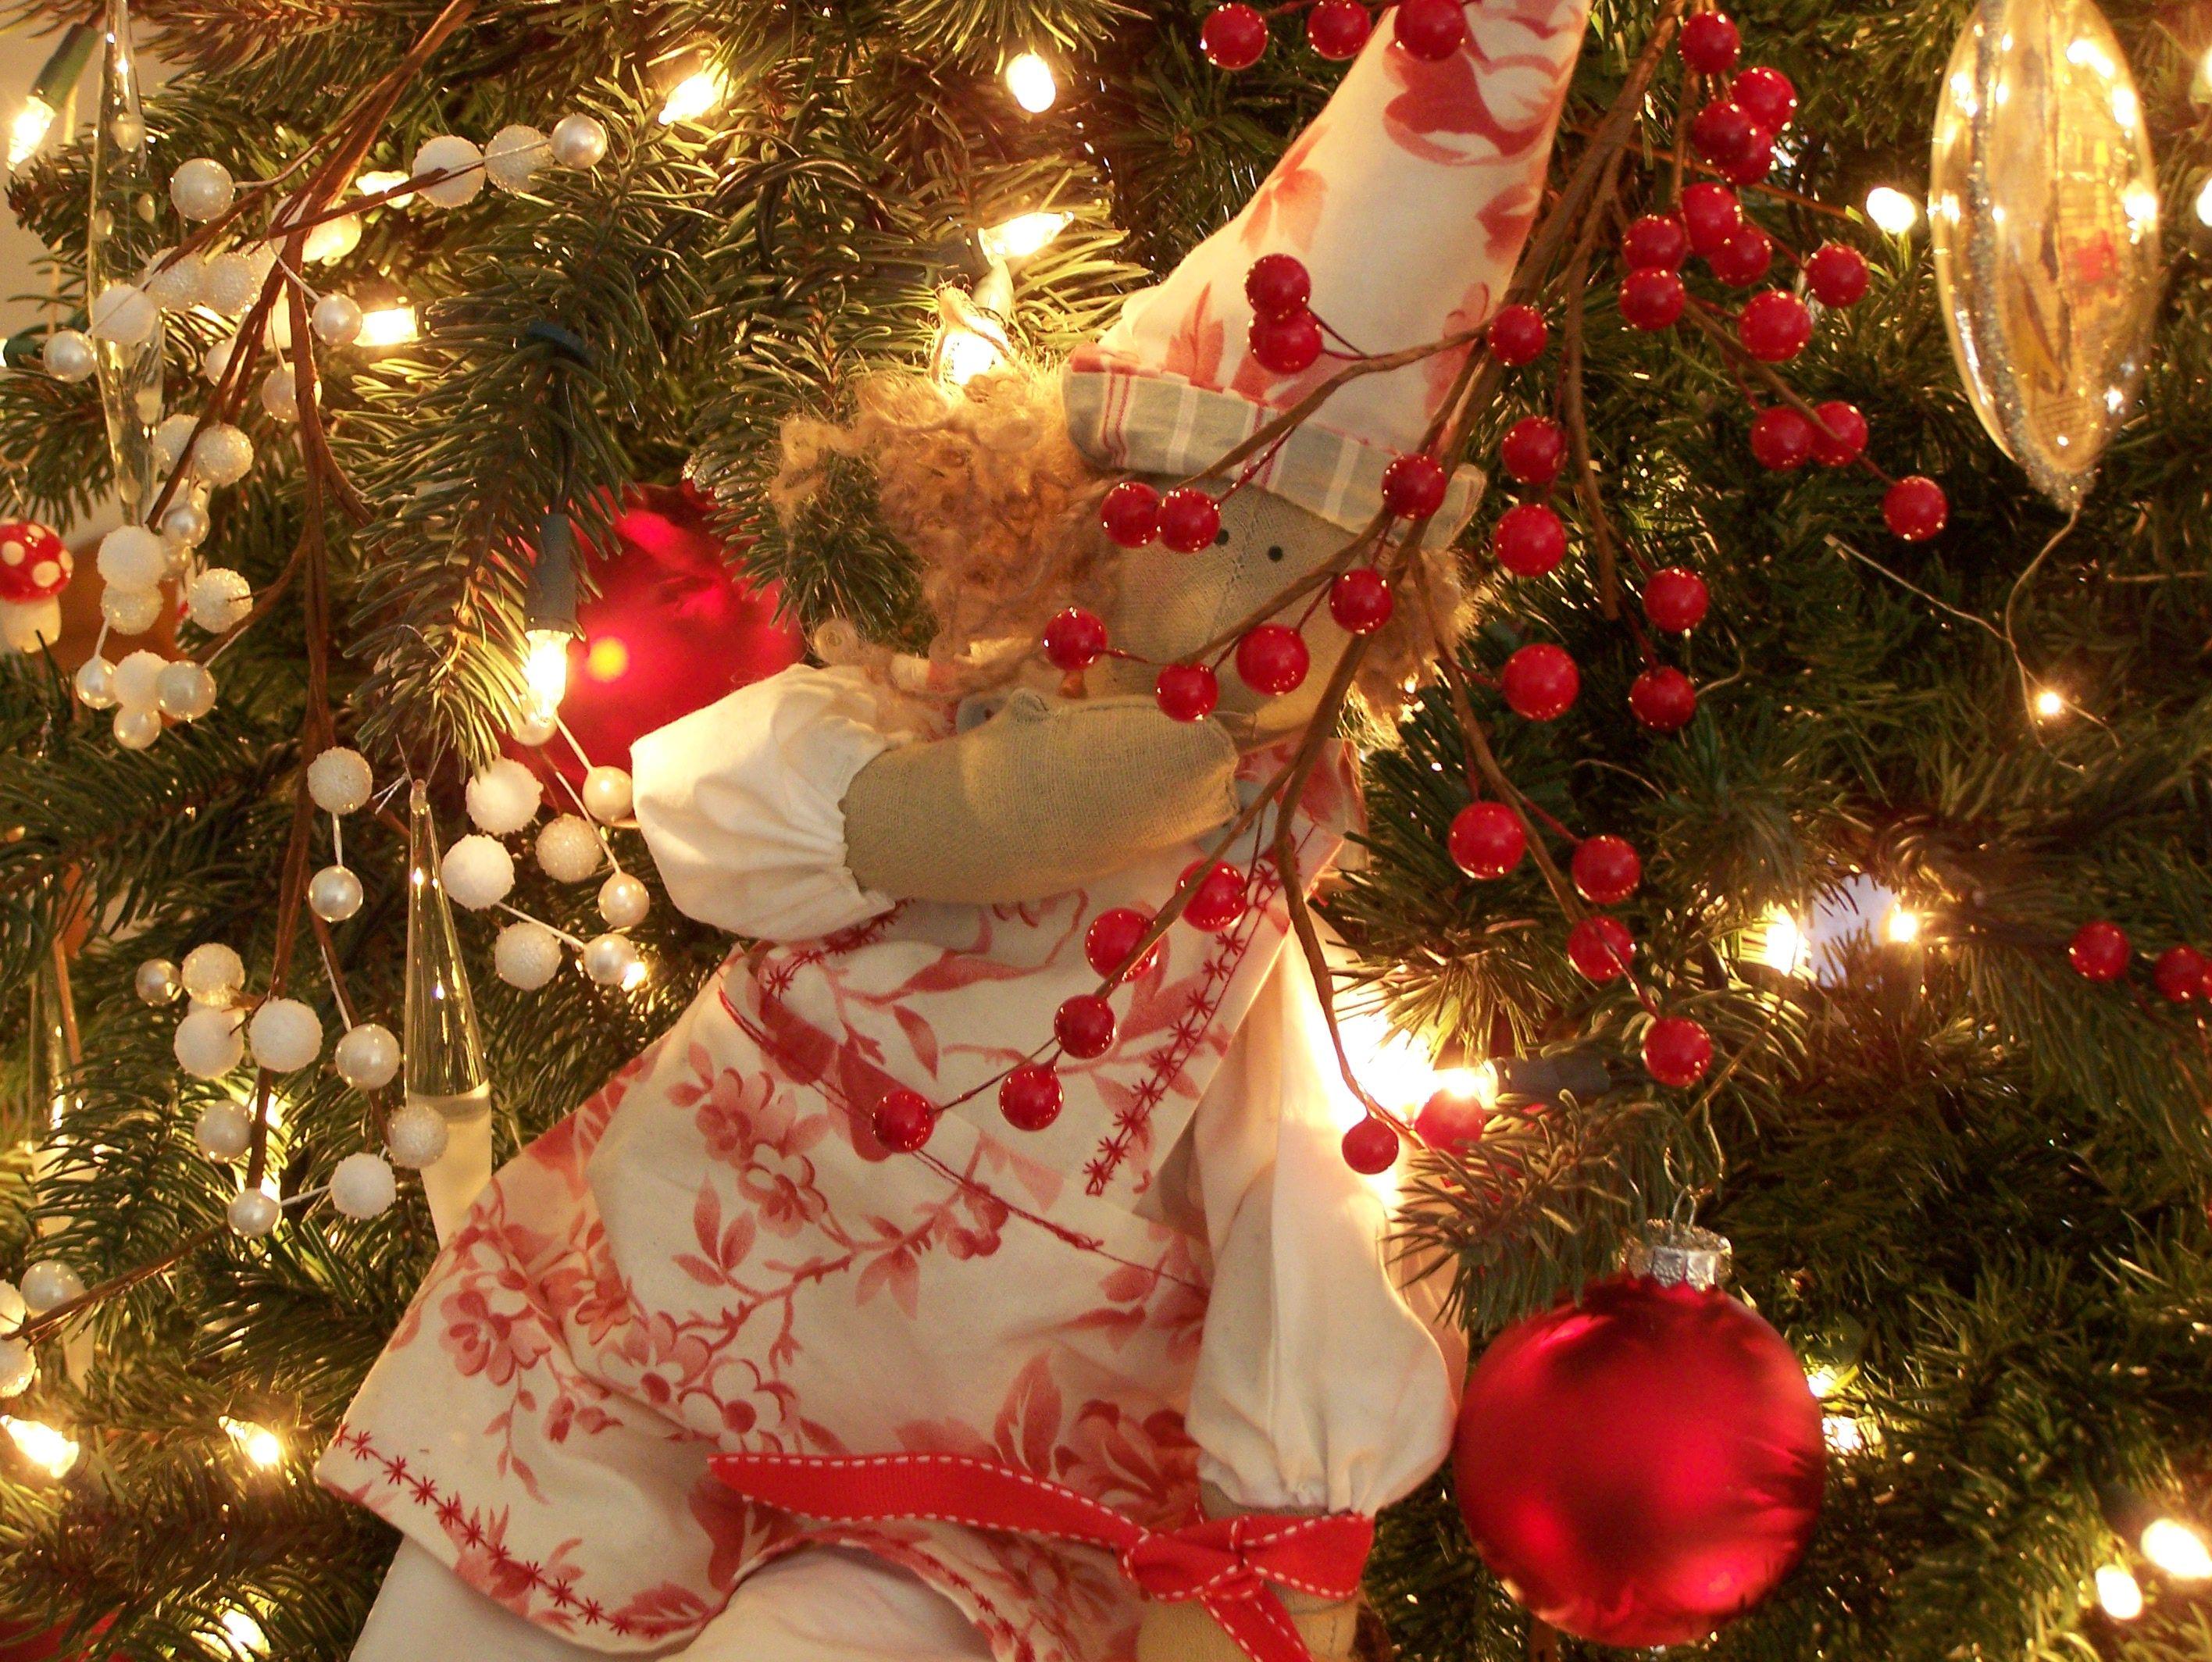 Christmas C h r i s t m a s